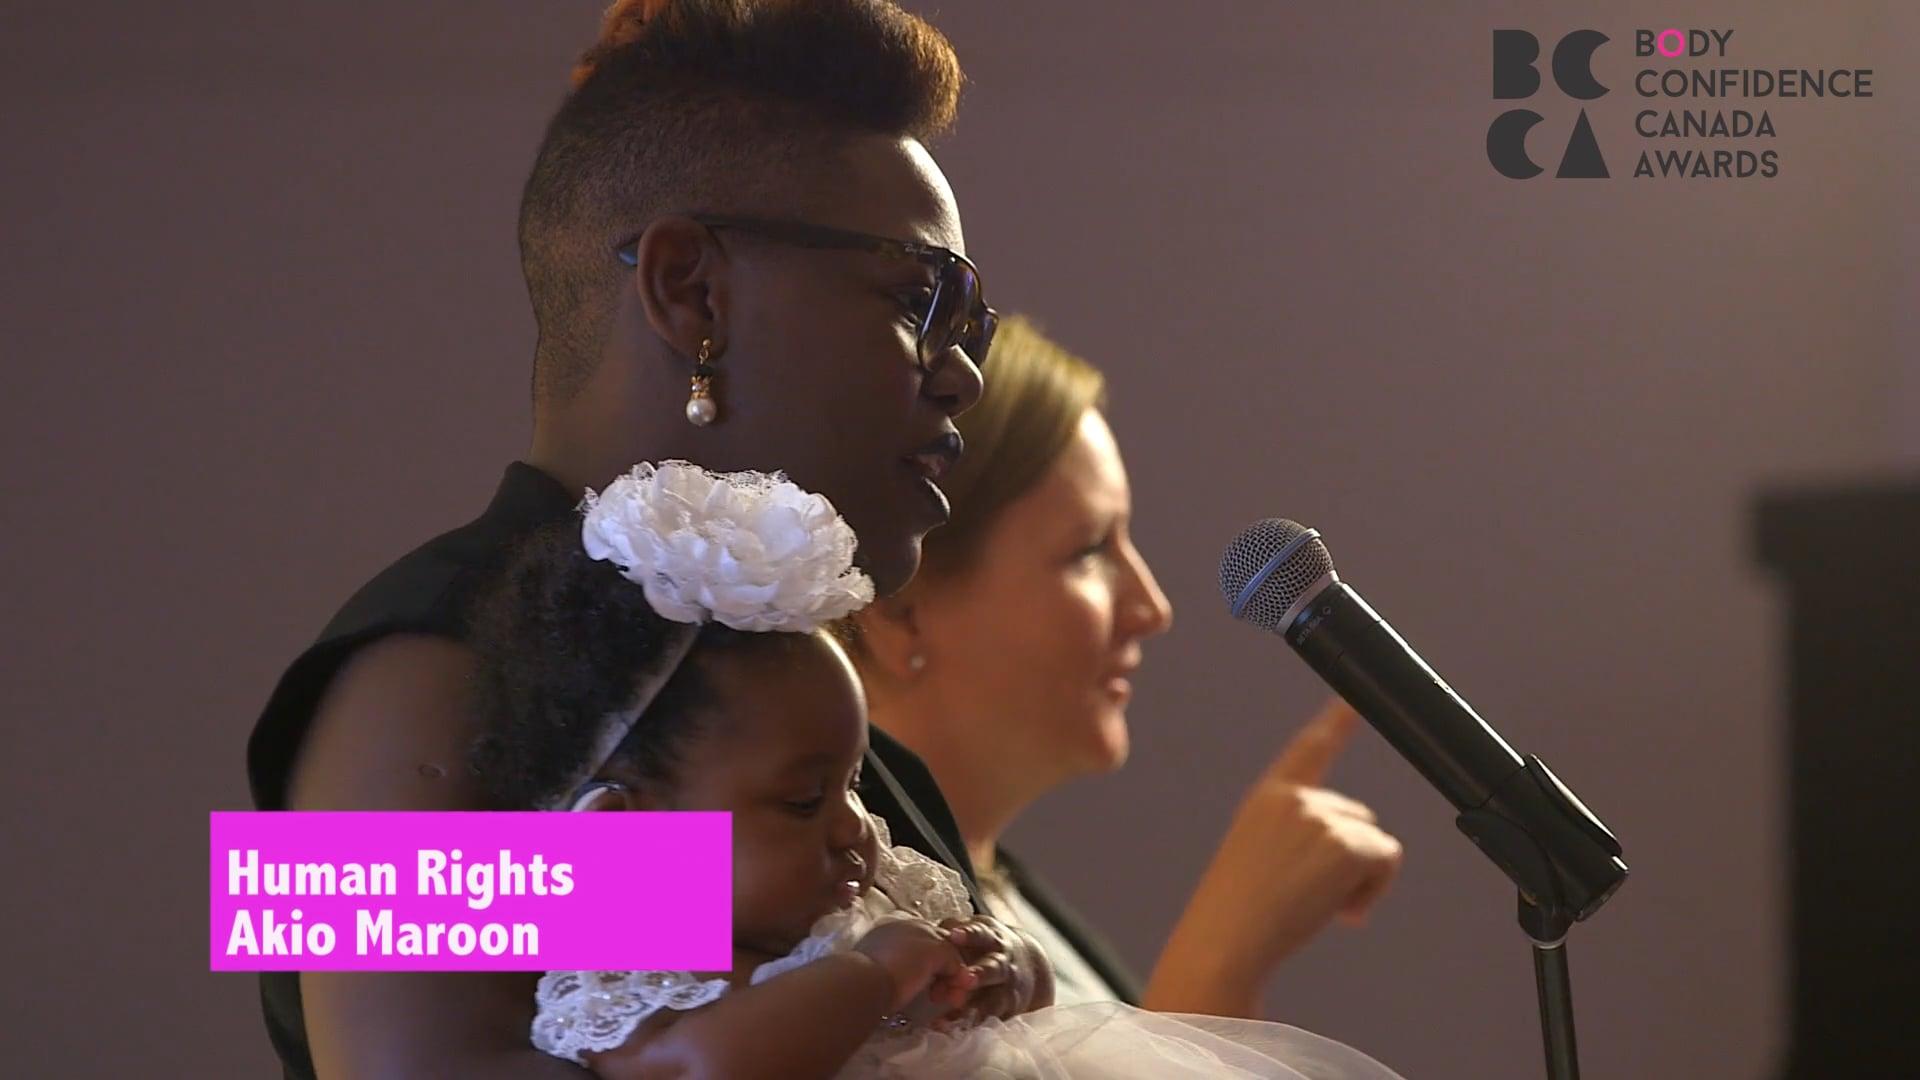 Human Rights Recipient - Akio Maroon